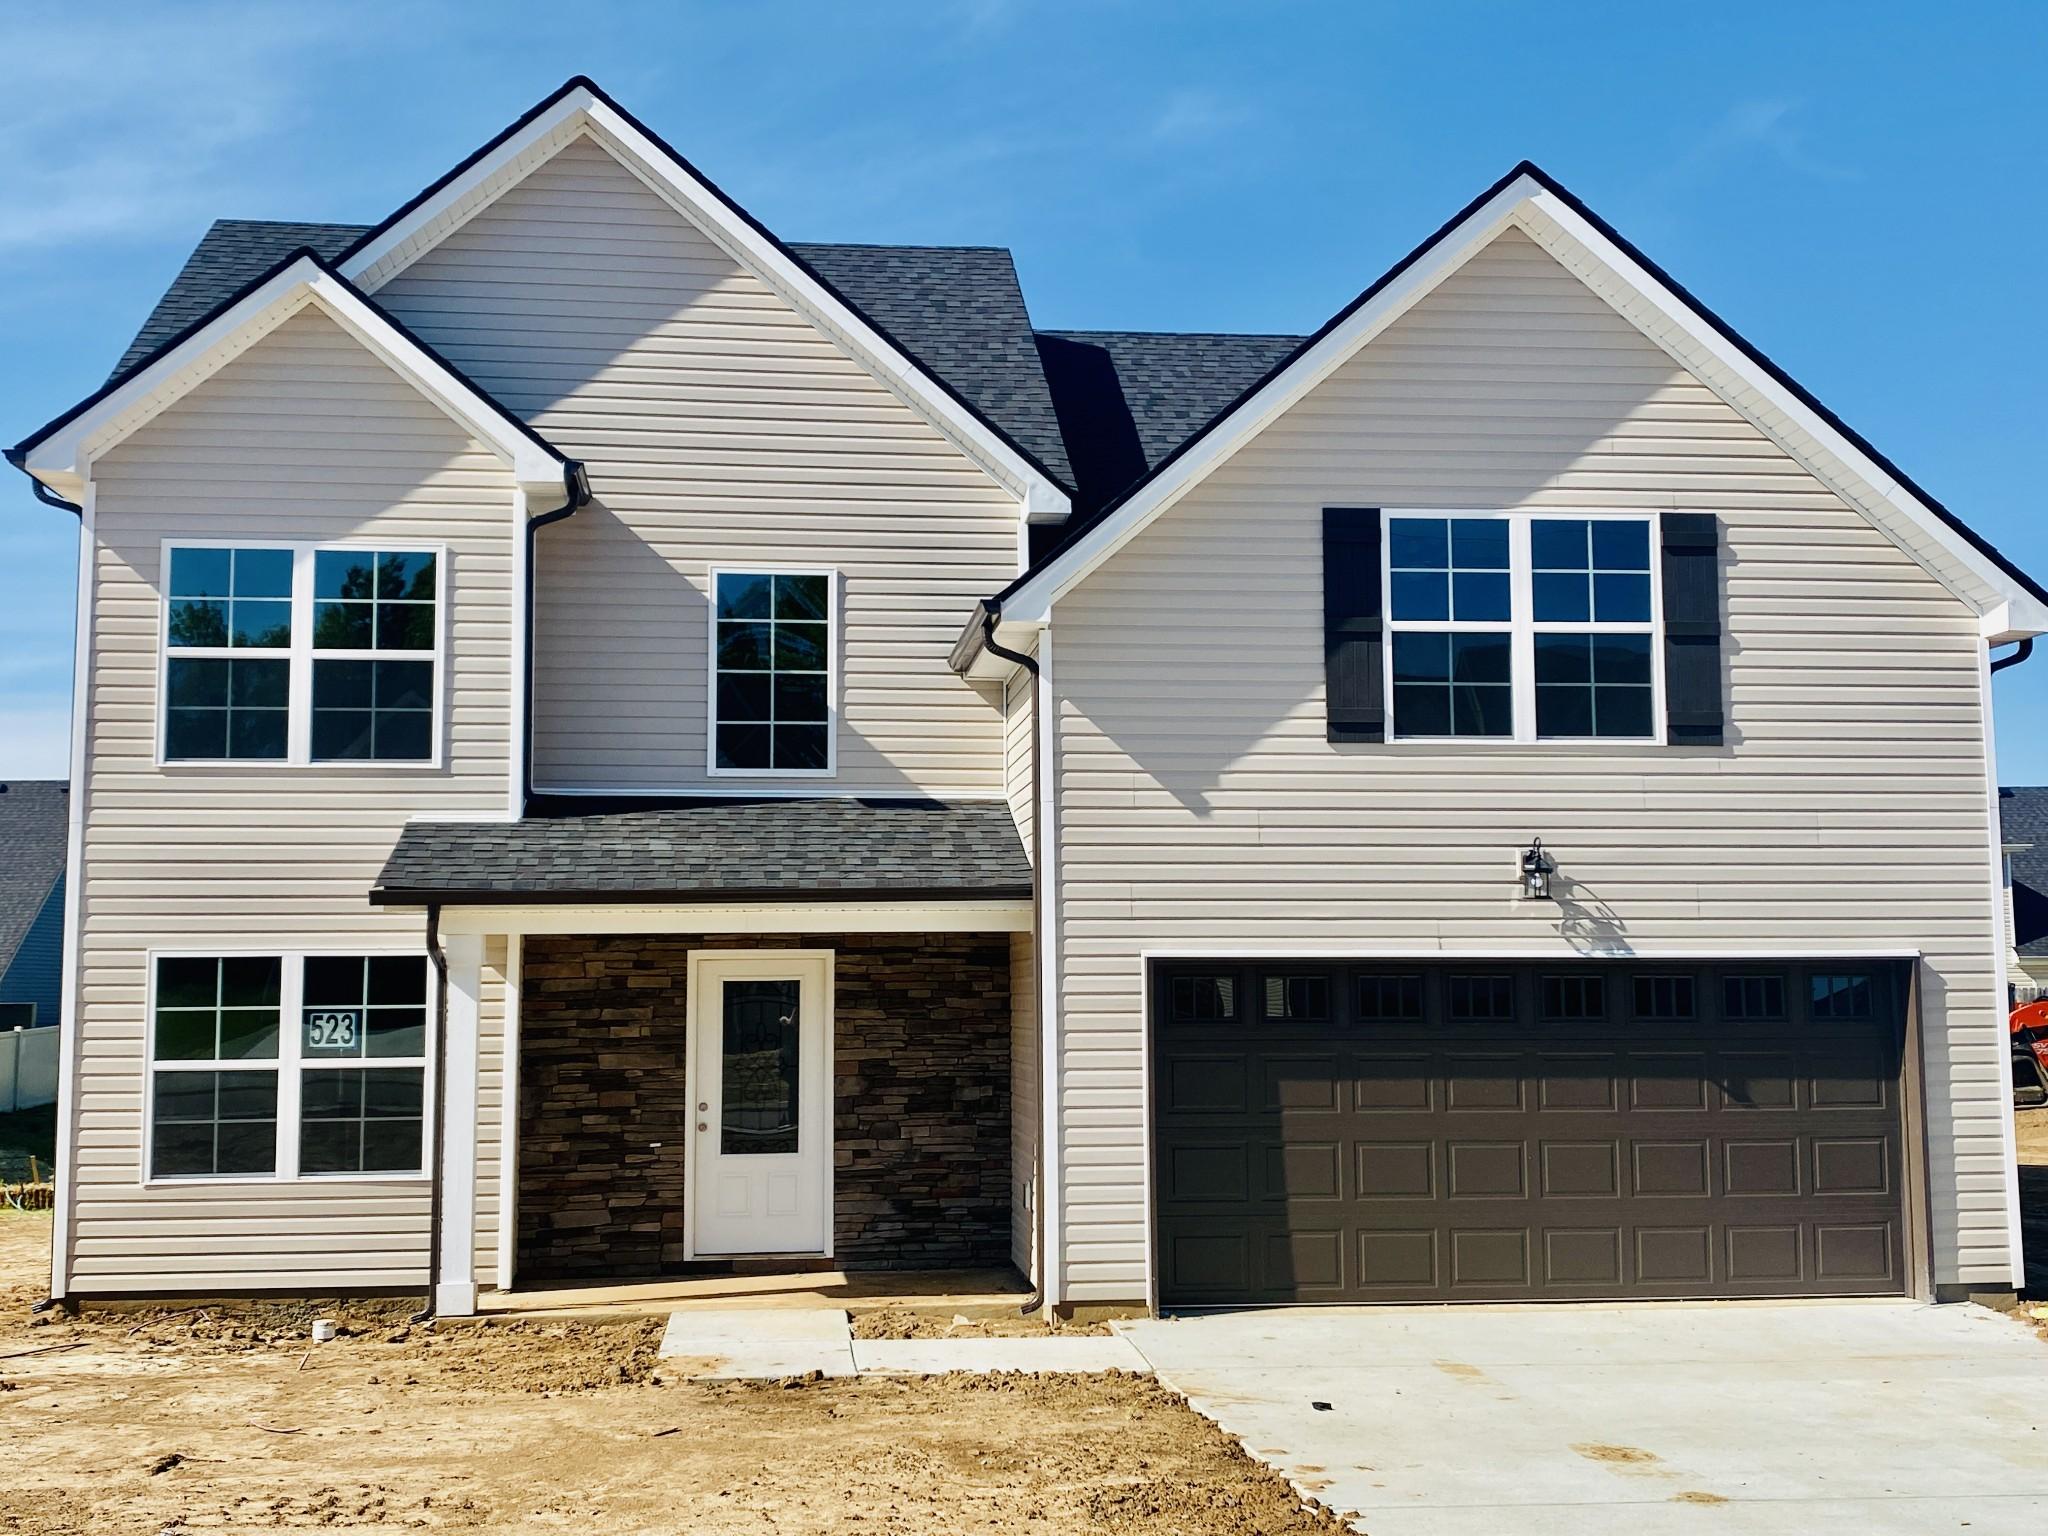 2016 Hackensack Ln, Property Photo - Smyrna, TN real estate listing